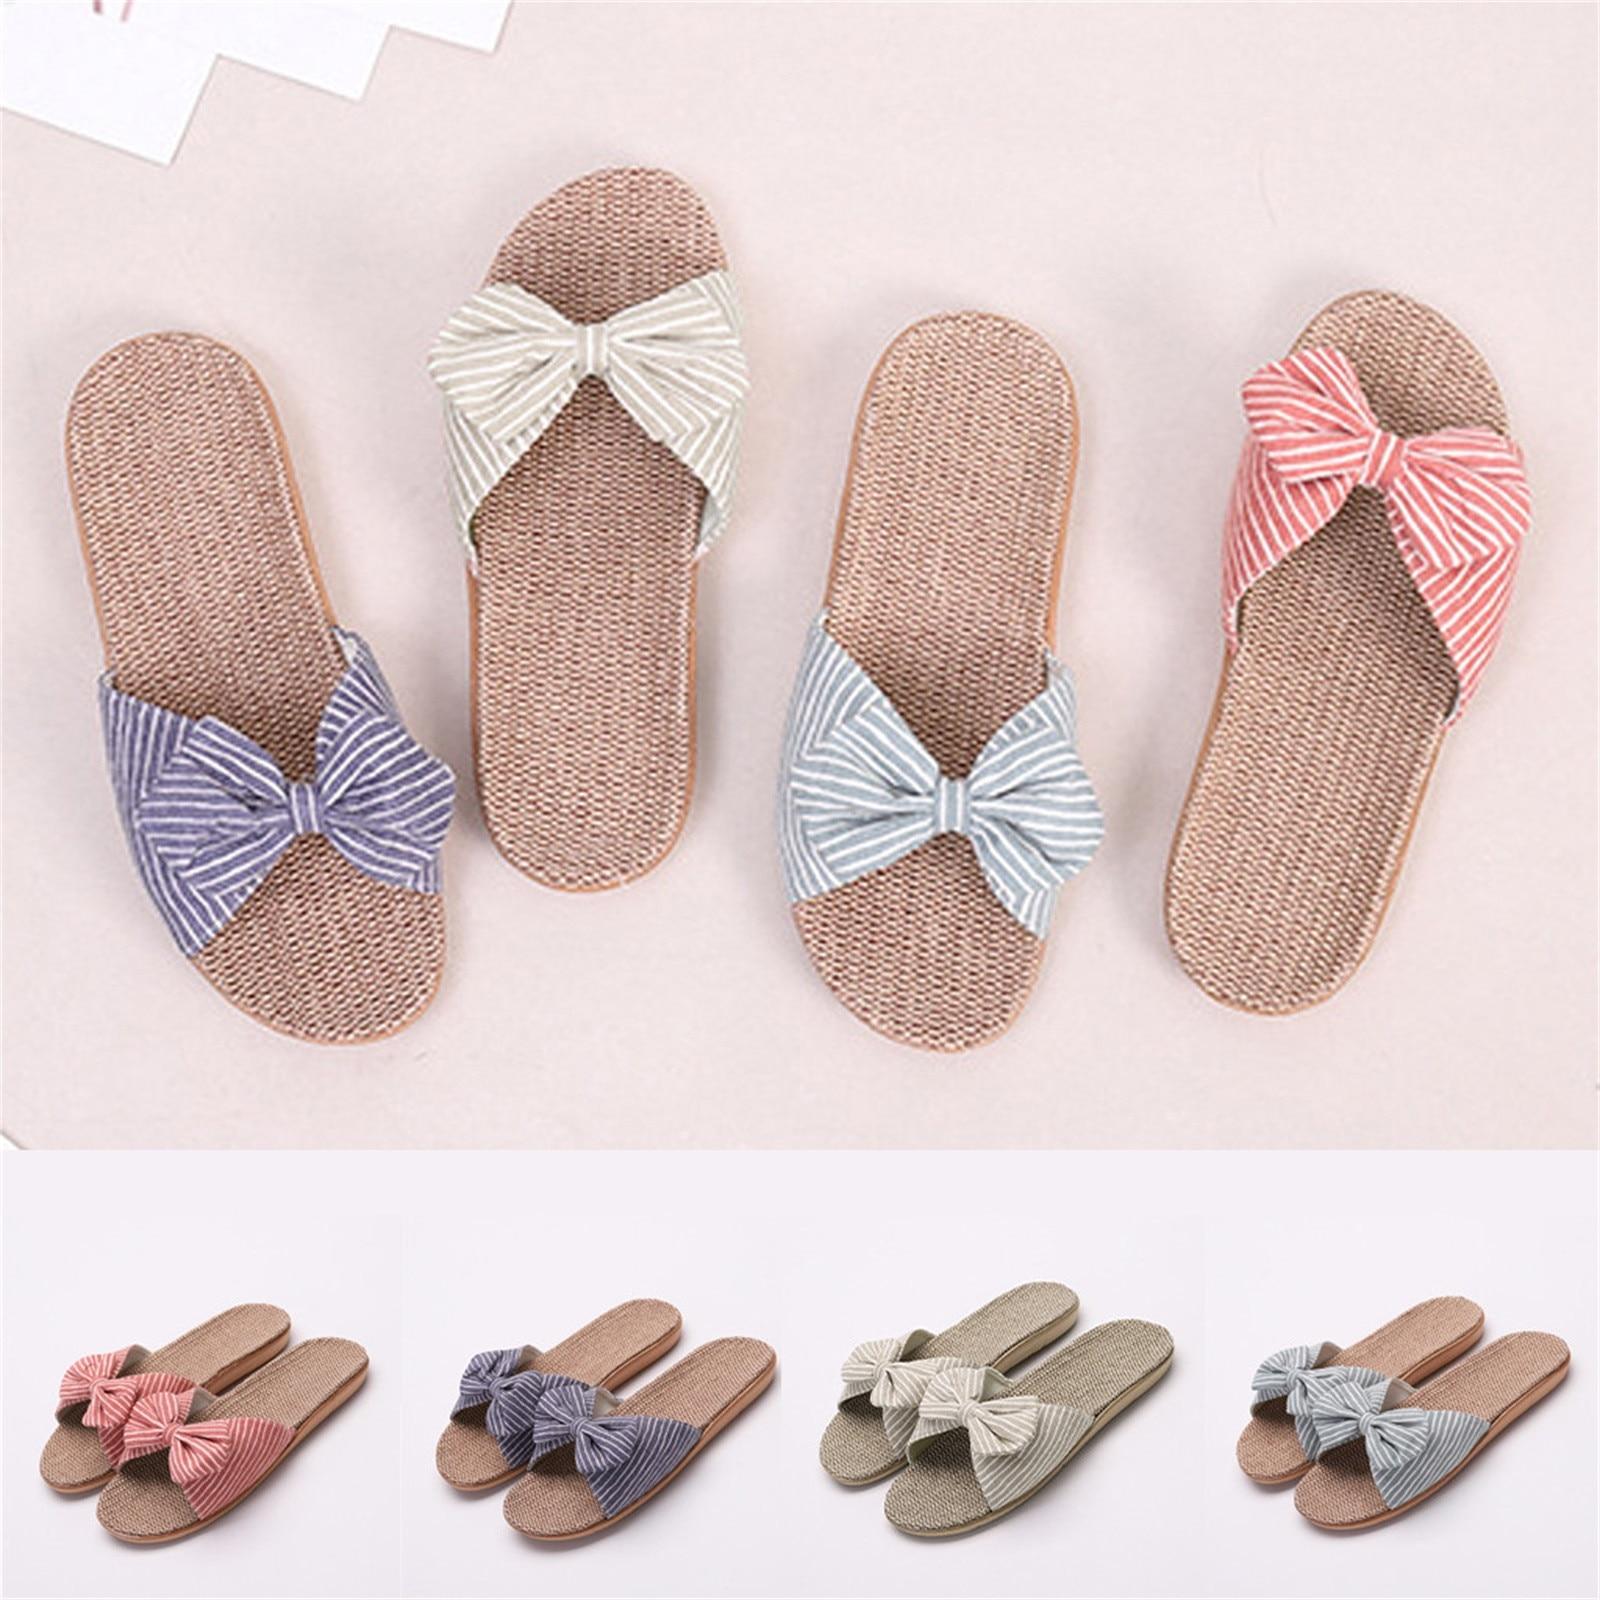 Women Female Bowknot Flax Linen Flip Flops Beach Shoes Sandals Slippers босоножки женс�